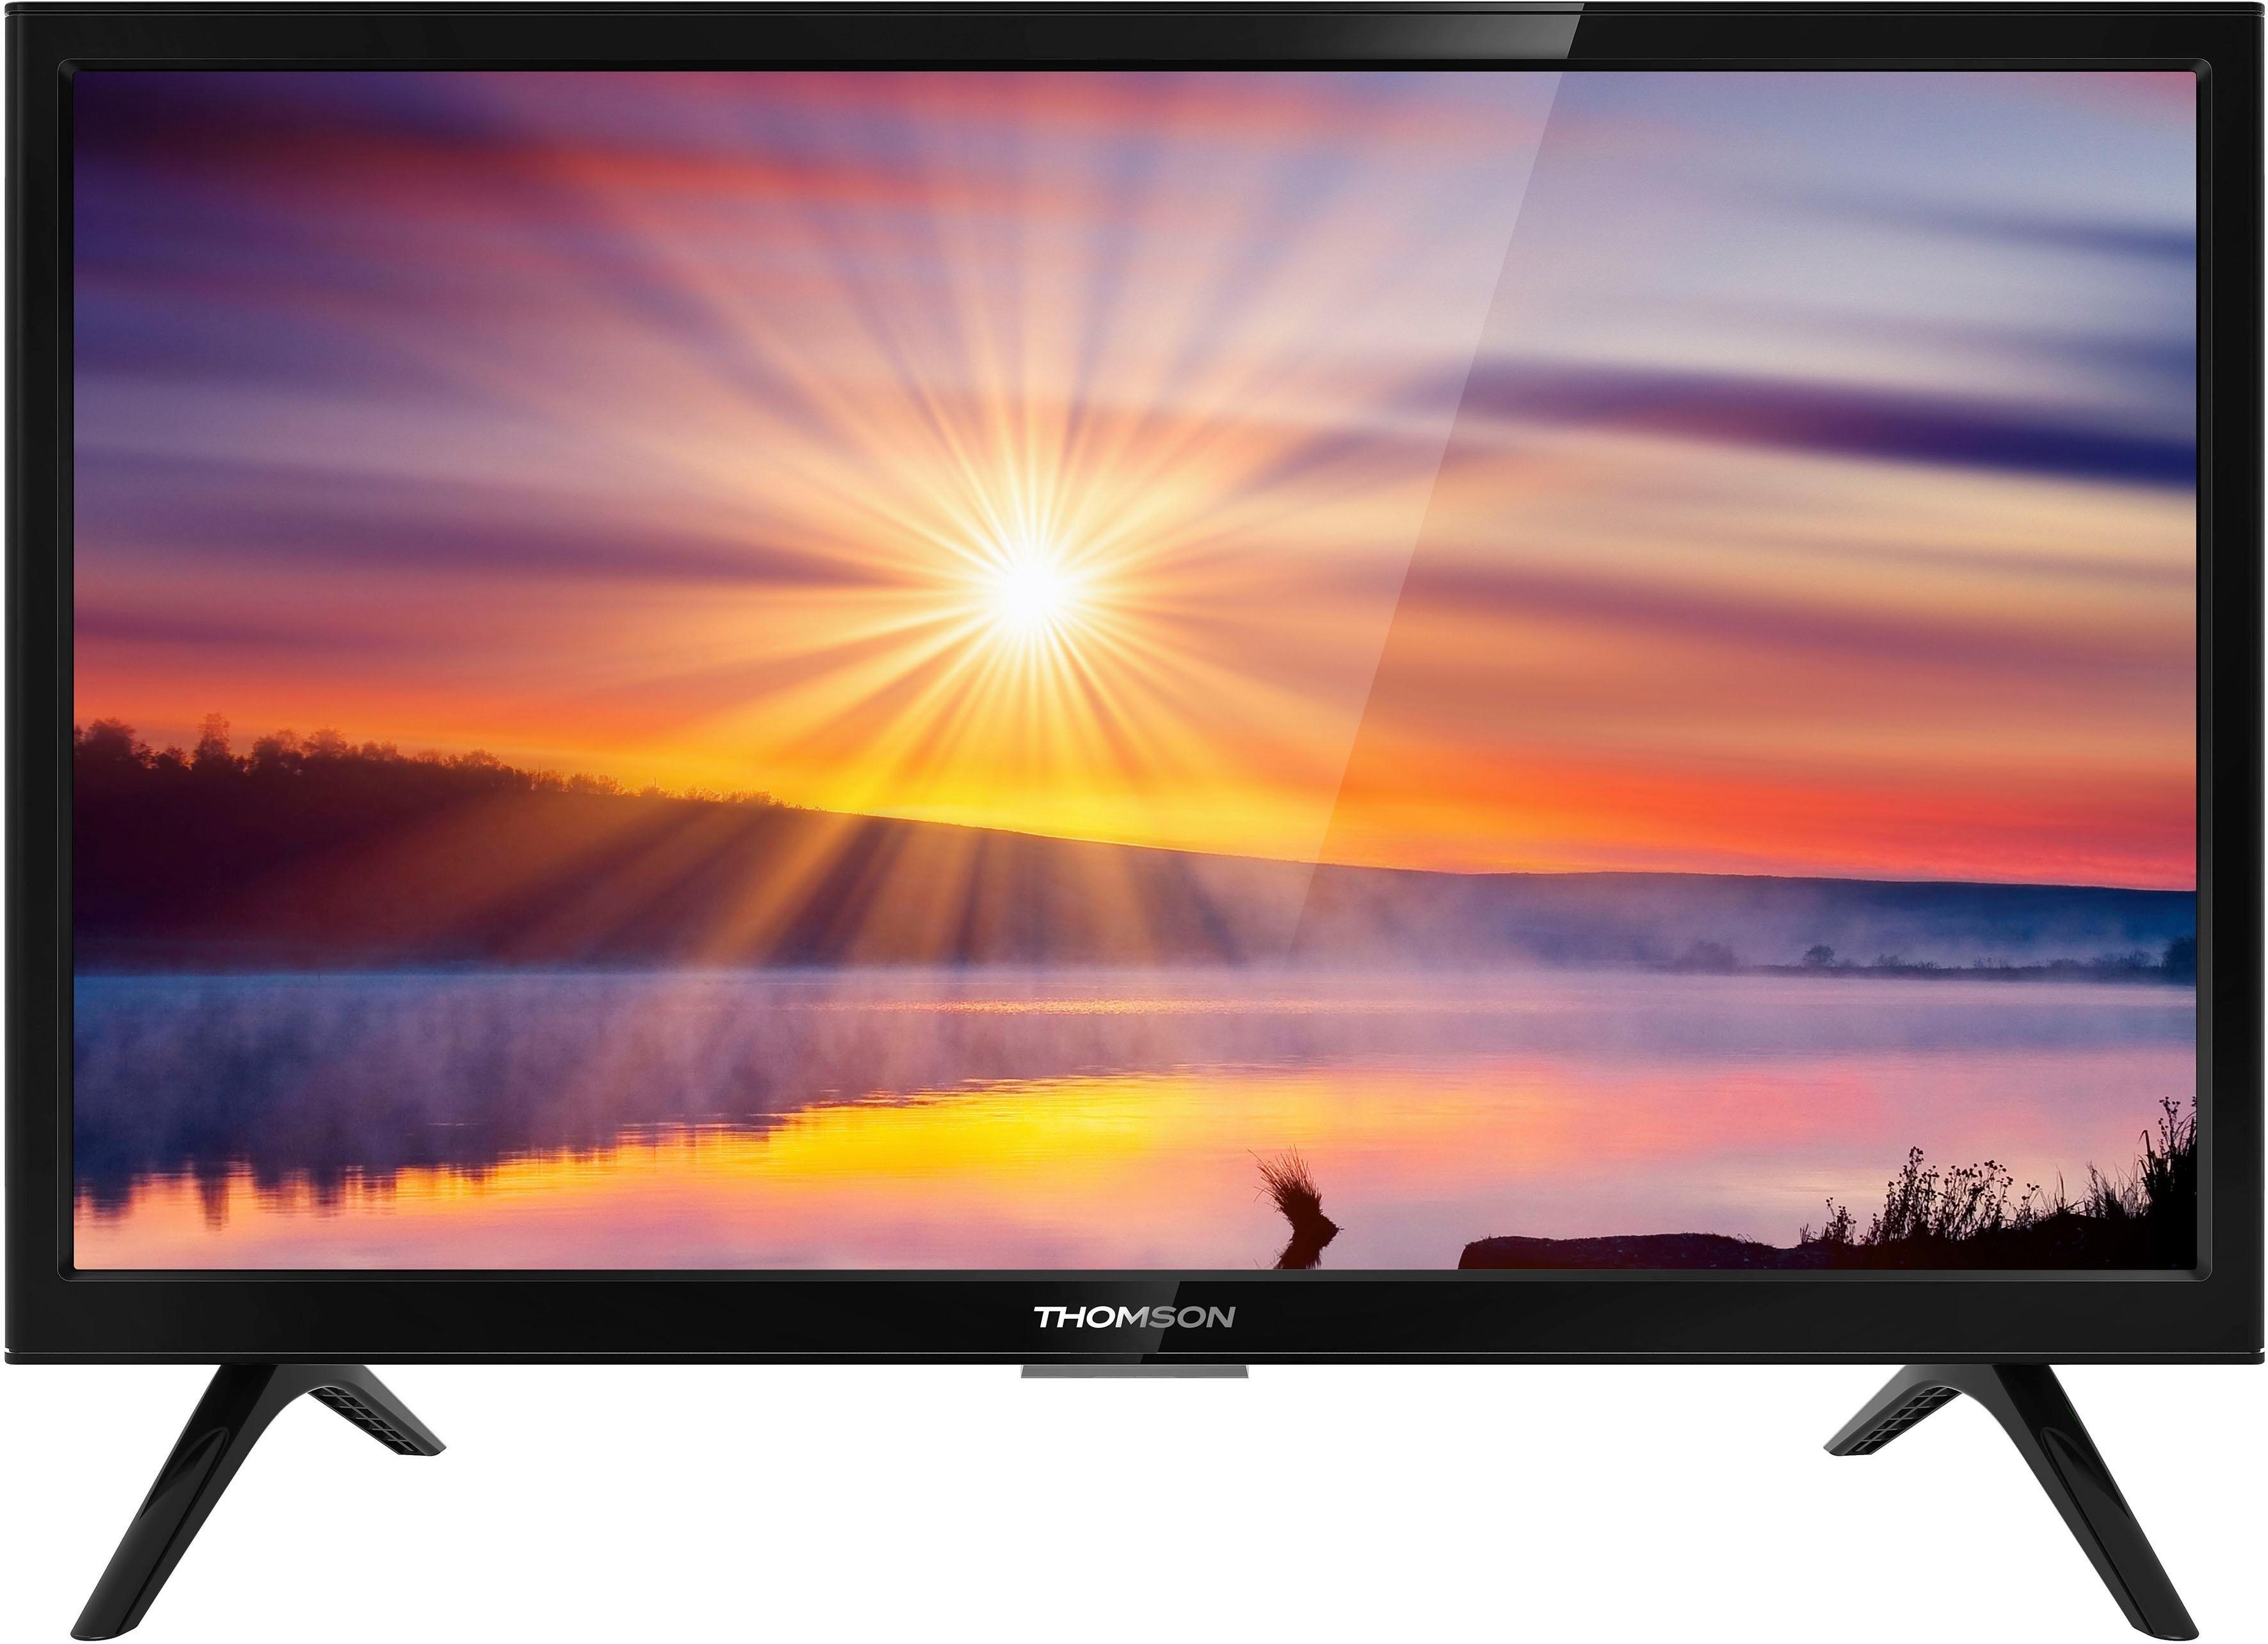 Thomson 28HD3206X1 led-tv (70 cm / 28 inch), HD nu online bestellen